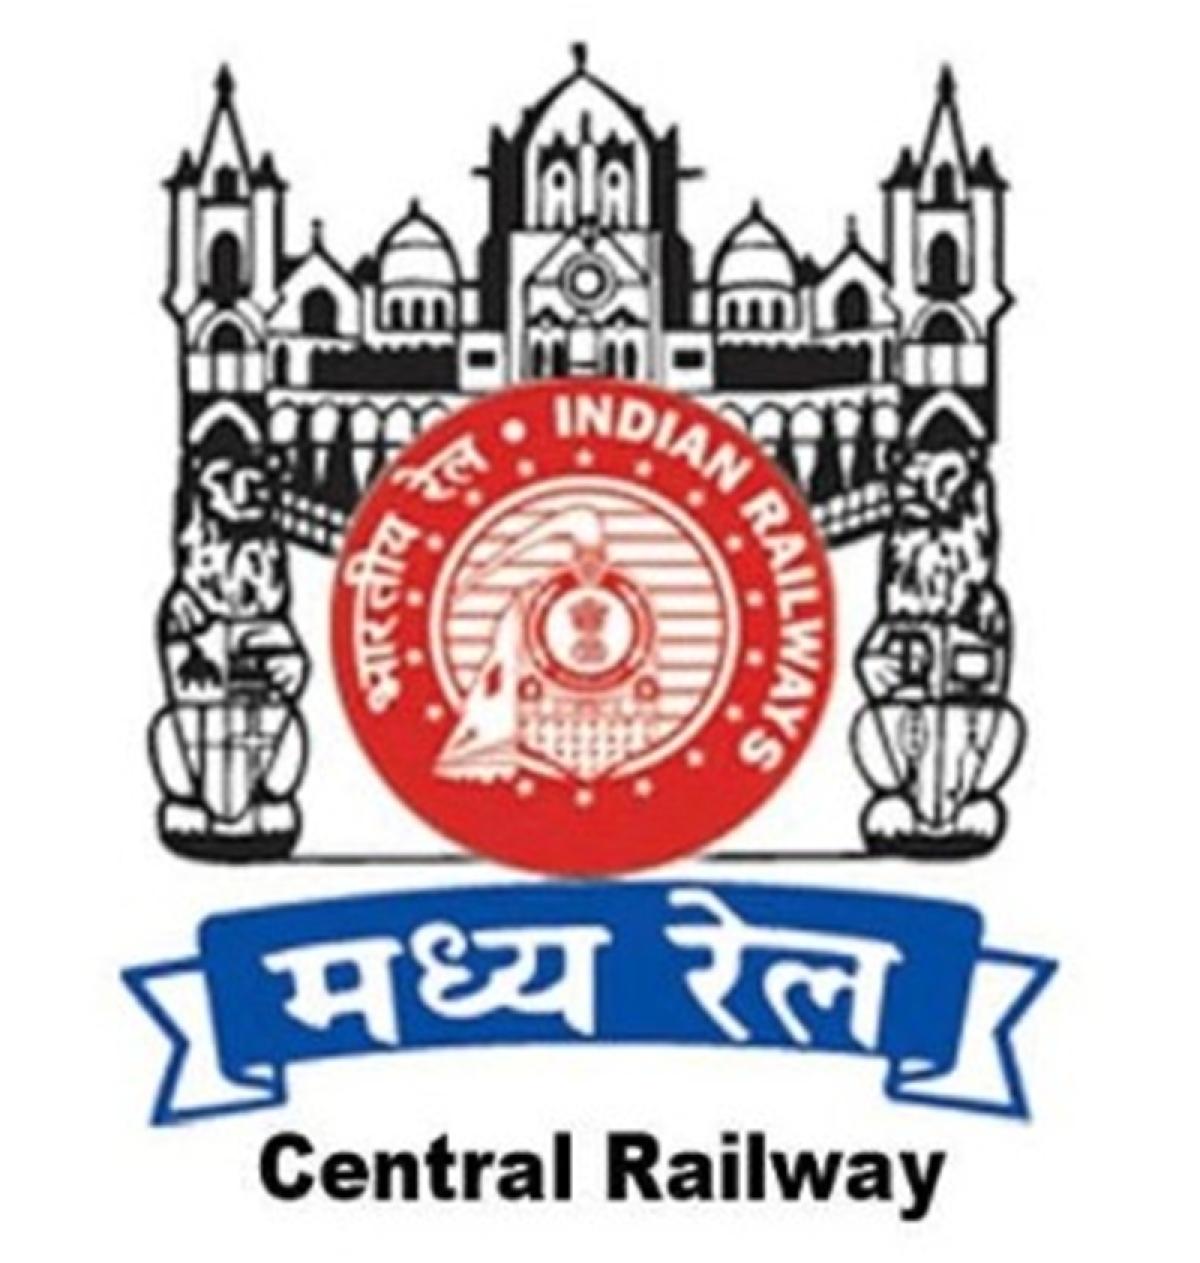 Mumbai: Rail fracture delays Central Railway train services